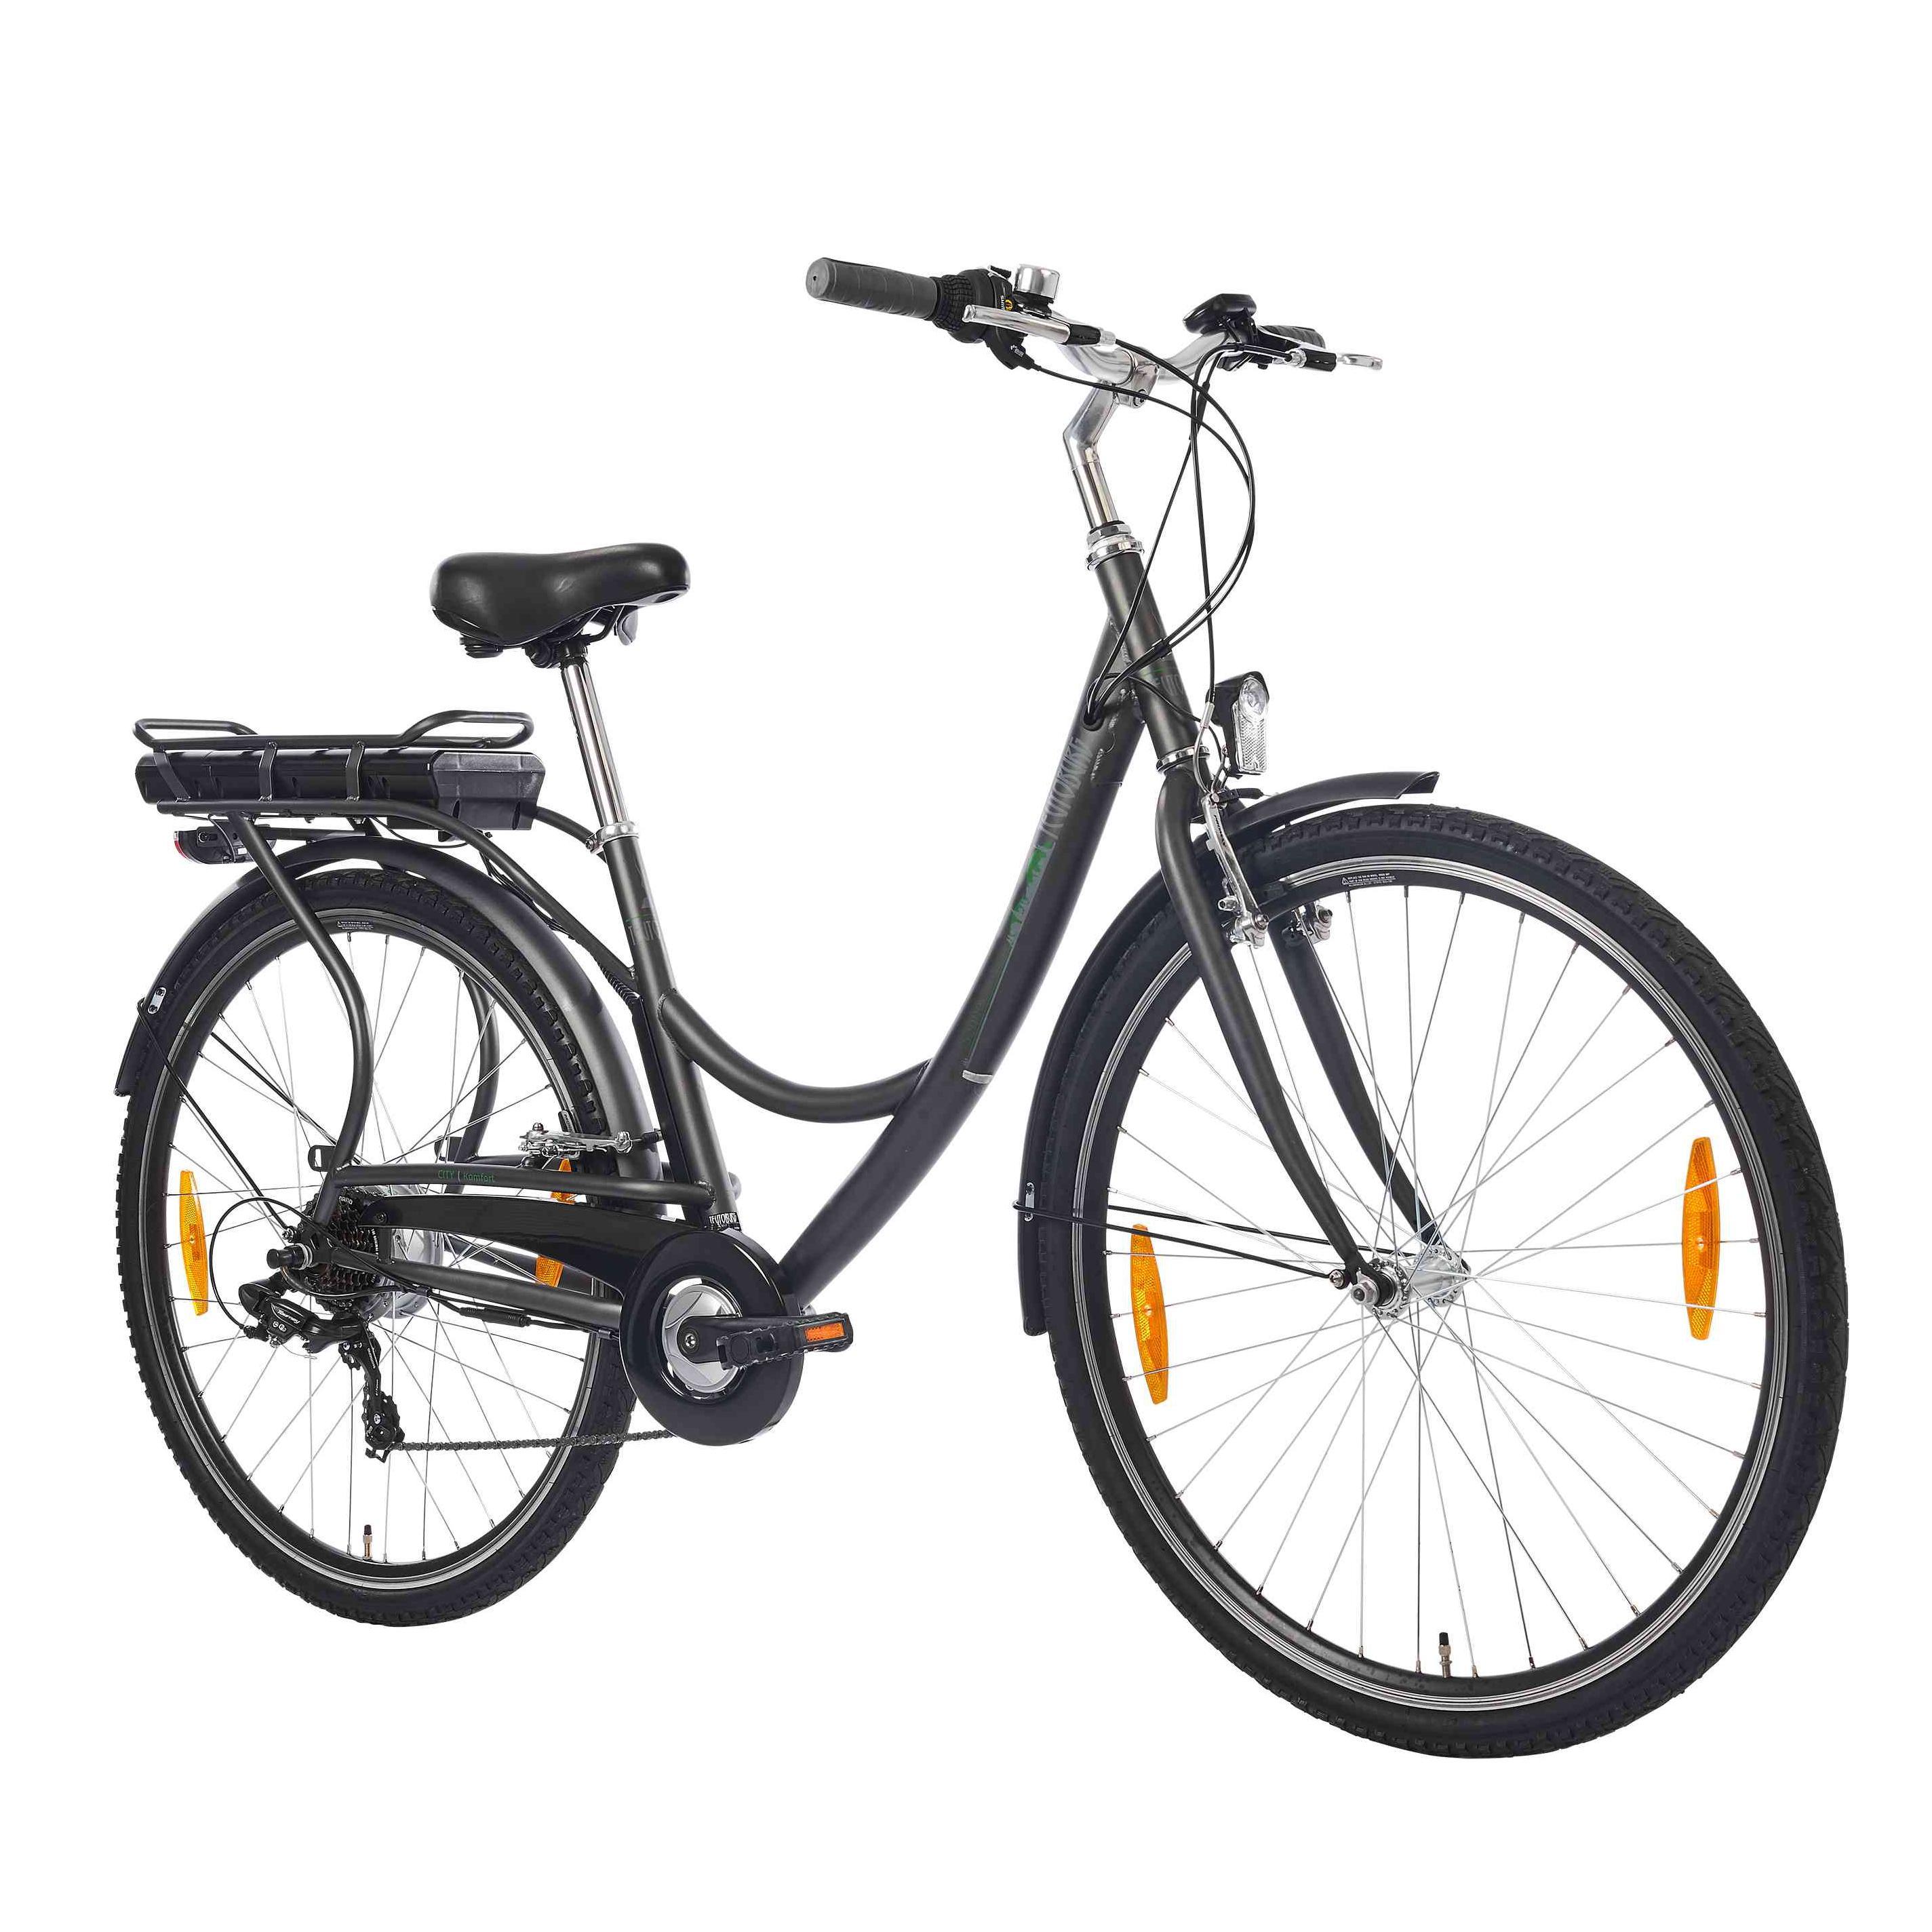 teutoburg senne pedelec citybike leicht elektrofahrrad 28. Black Bedroom Furniture Sets. Home Design Ideas